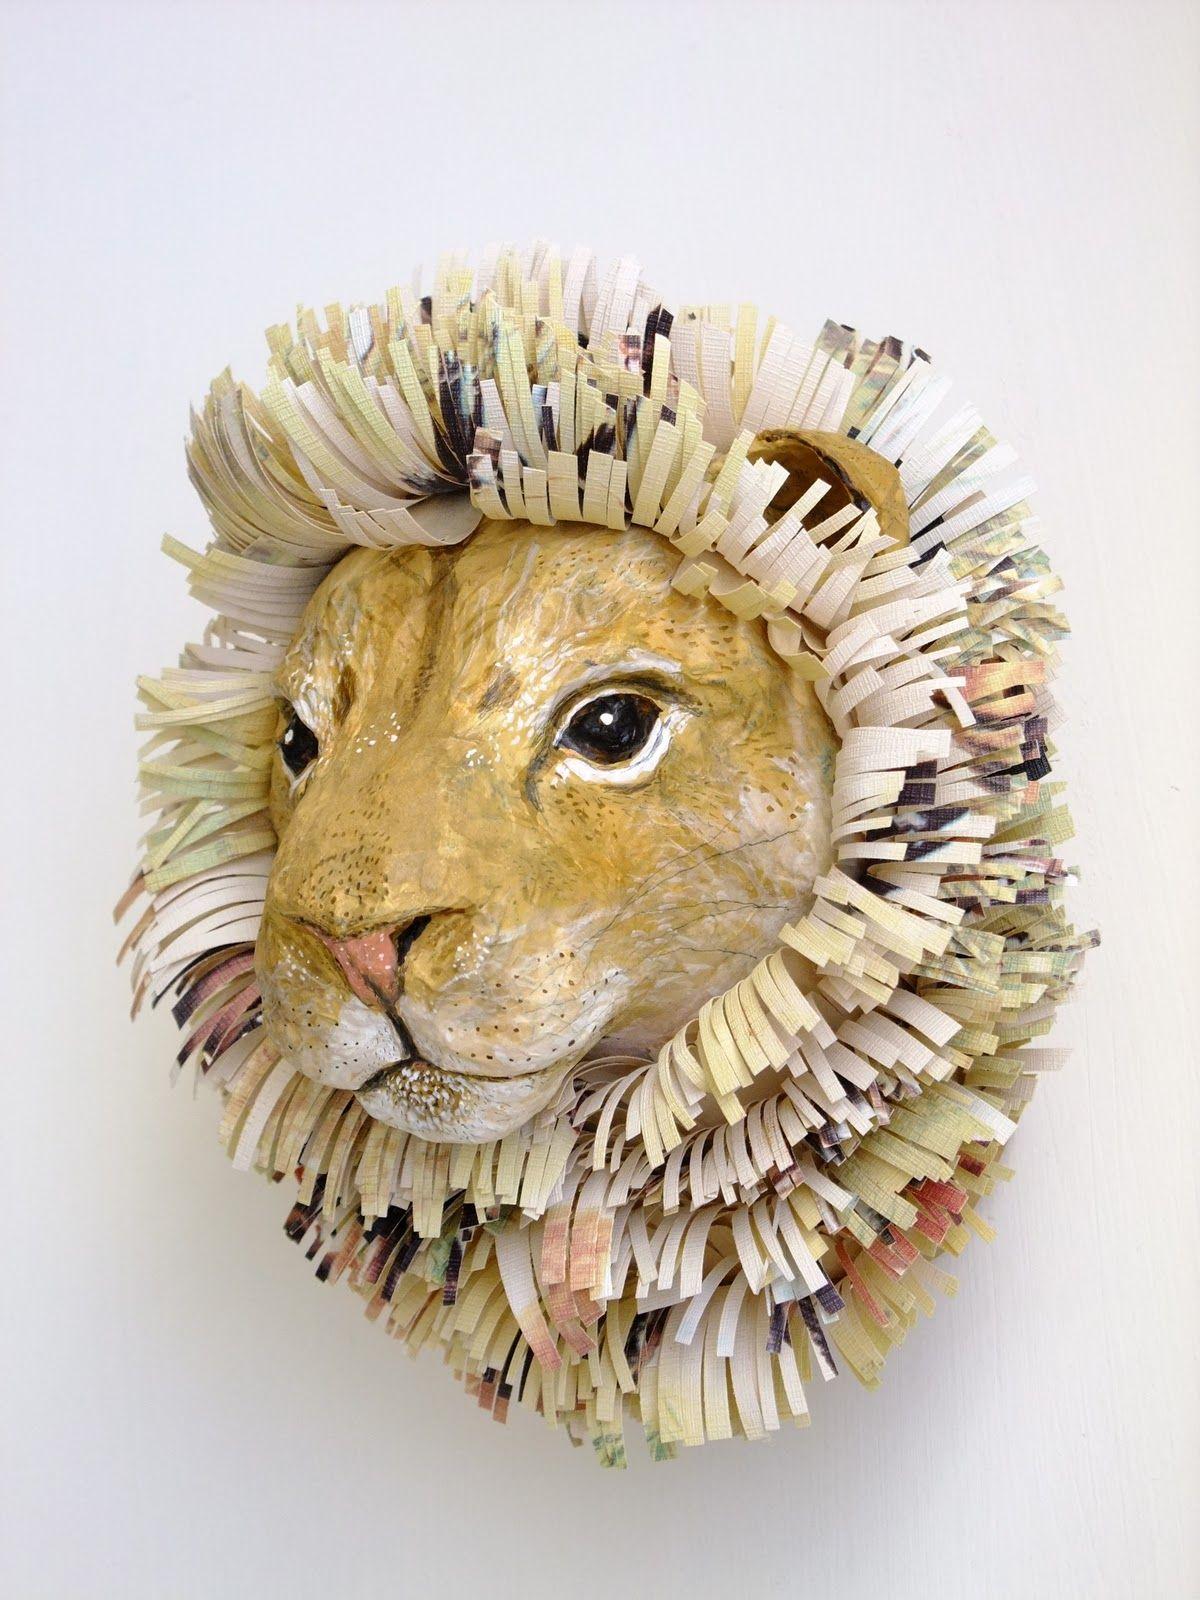 emily warren papier mache animals creatures great and small